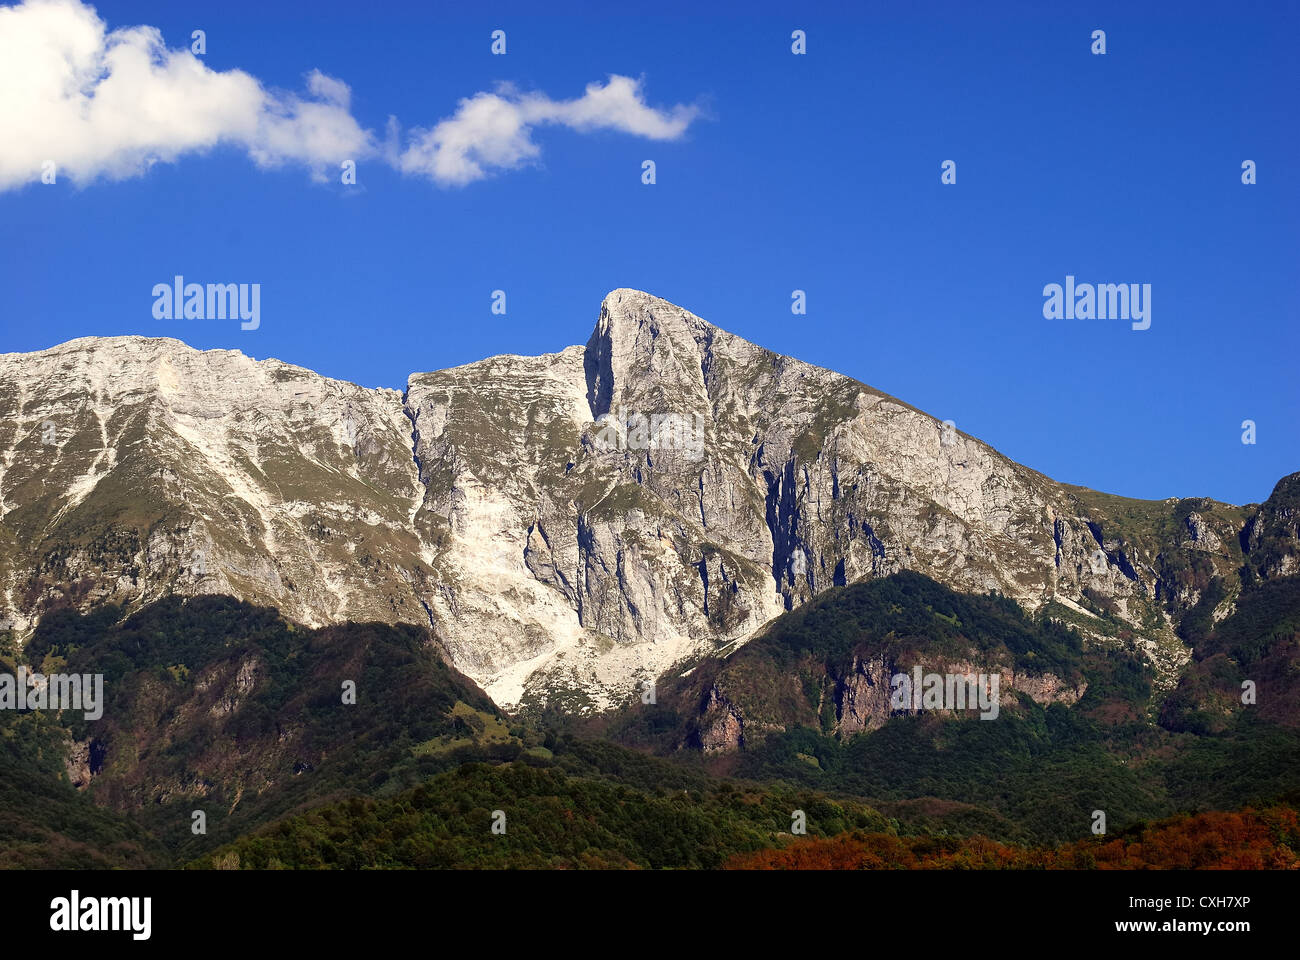 Slovenia : Mount Krn seen from Kobarid.  Mount Krn  was the scene of fierce battles during the World War One. - Stock Image